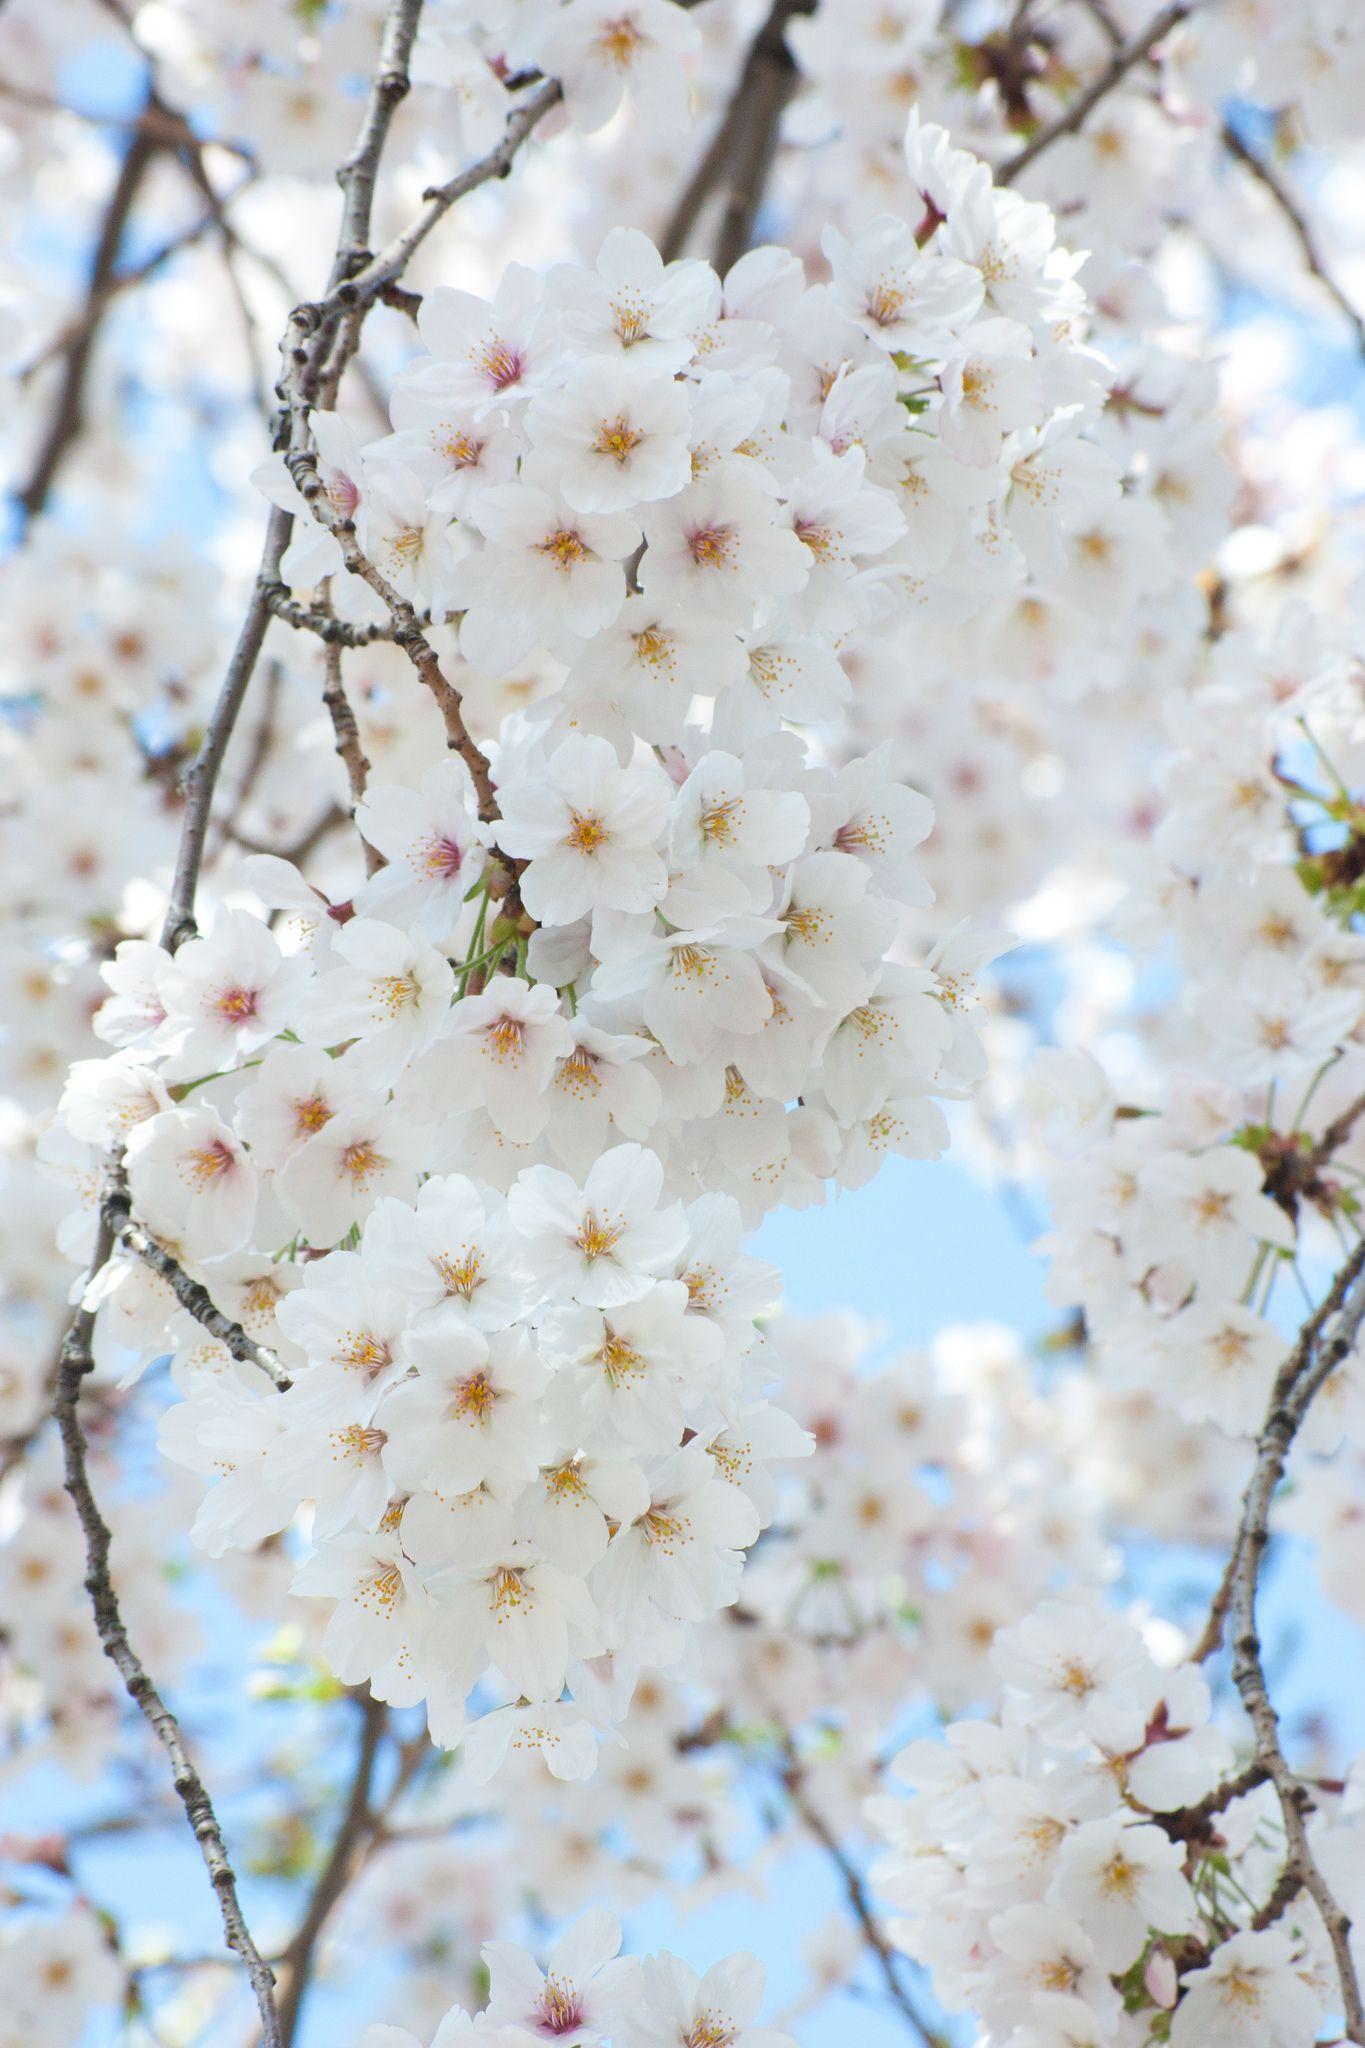 Sakura 2012 Cherry Blossoms Sakura Cherry Blossom Cherry Blossoms